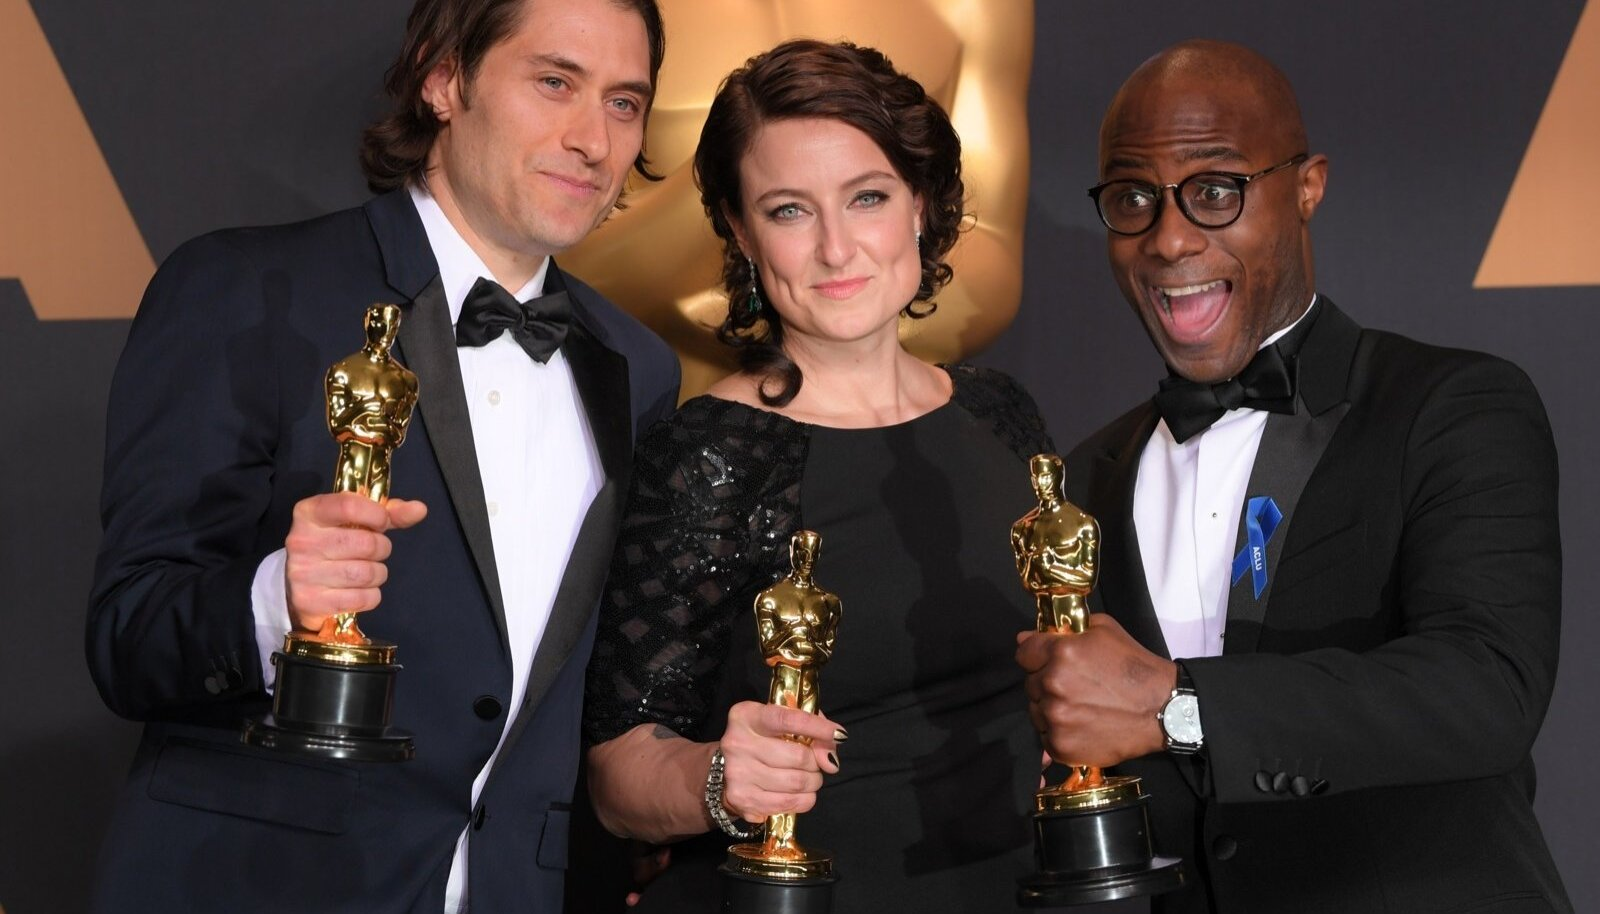 89th Annual Academy Awards, Press Room, Los Angeles, USA - 26 Feb 2017